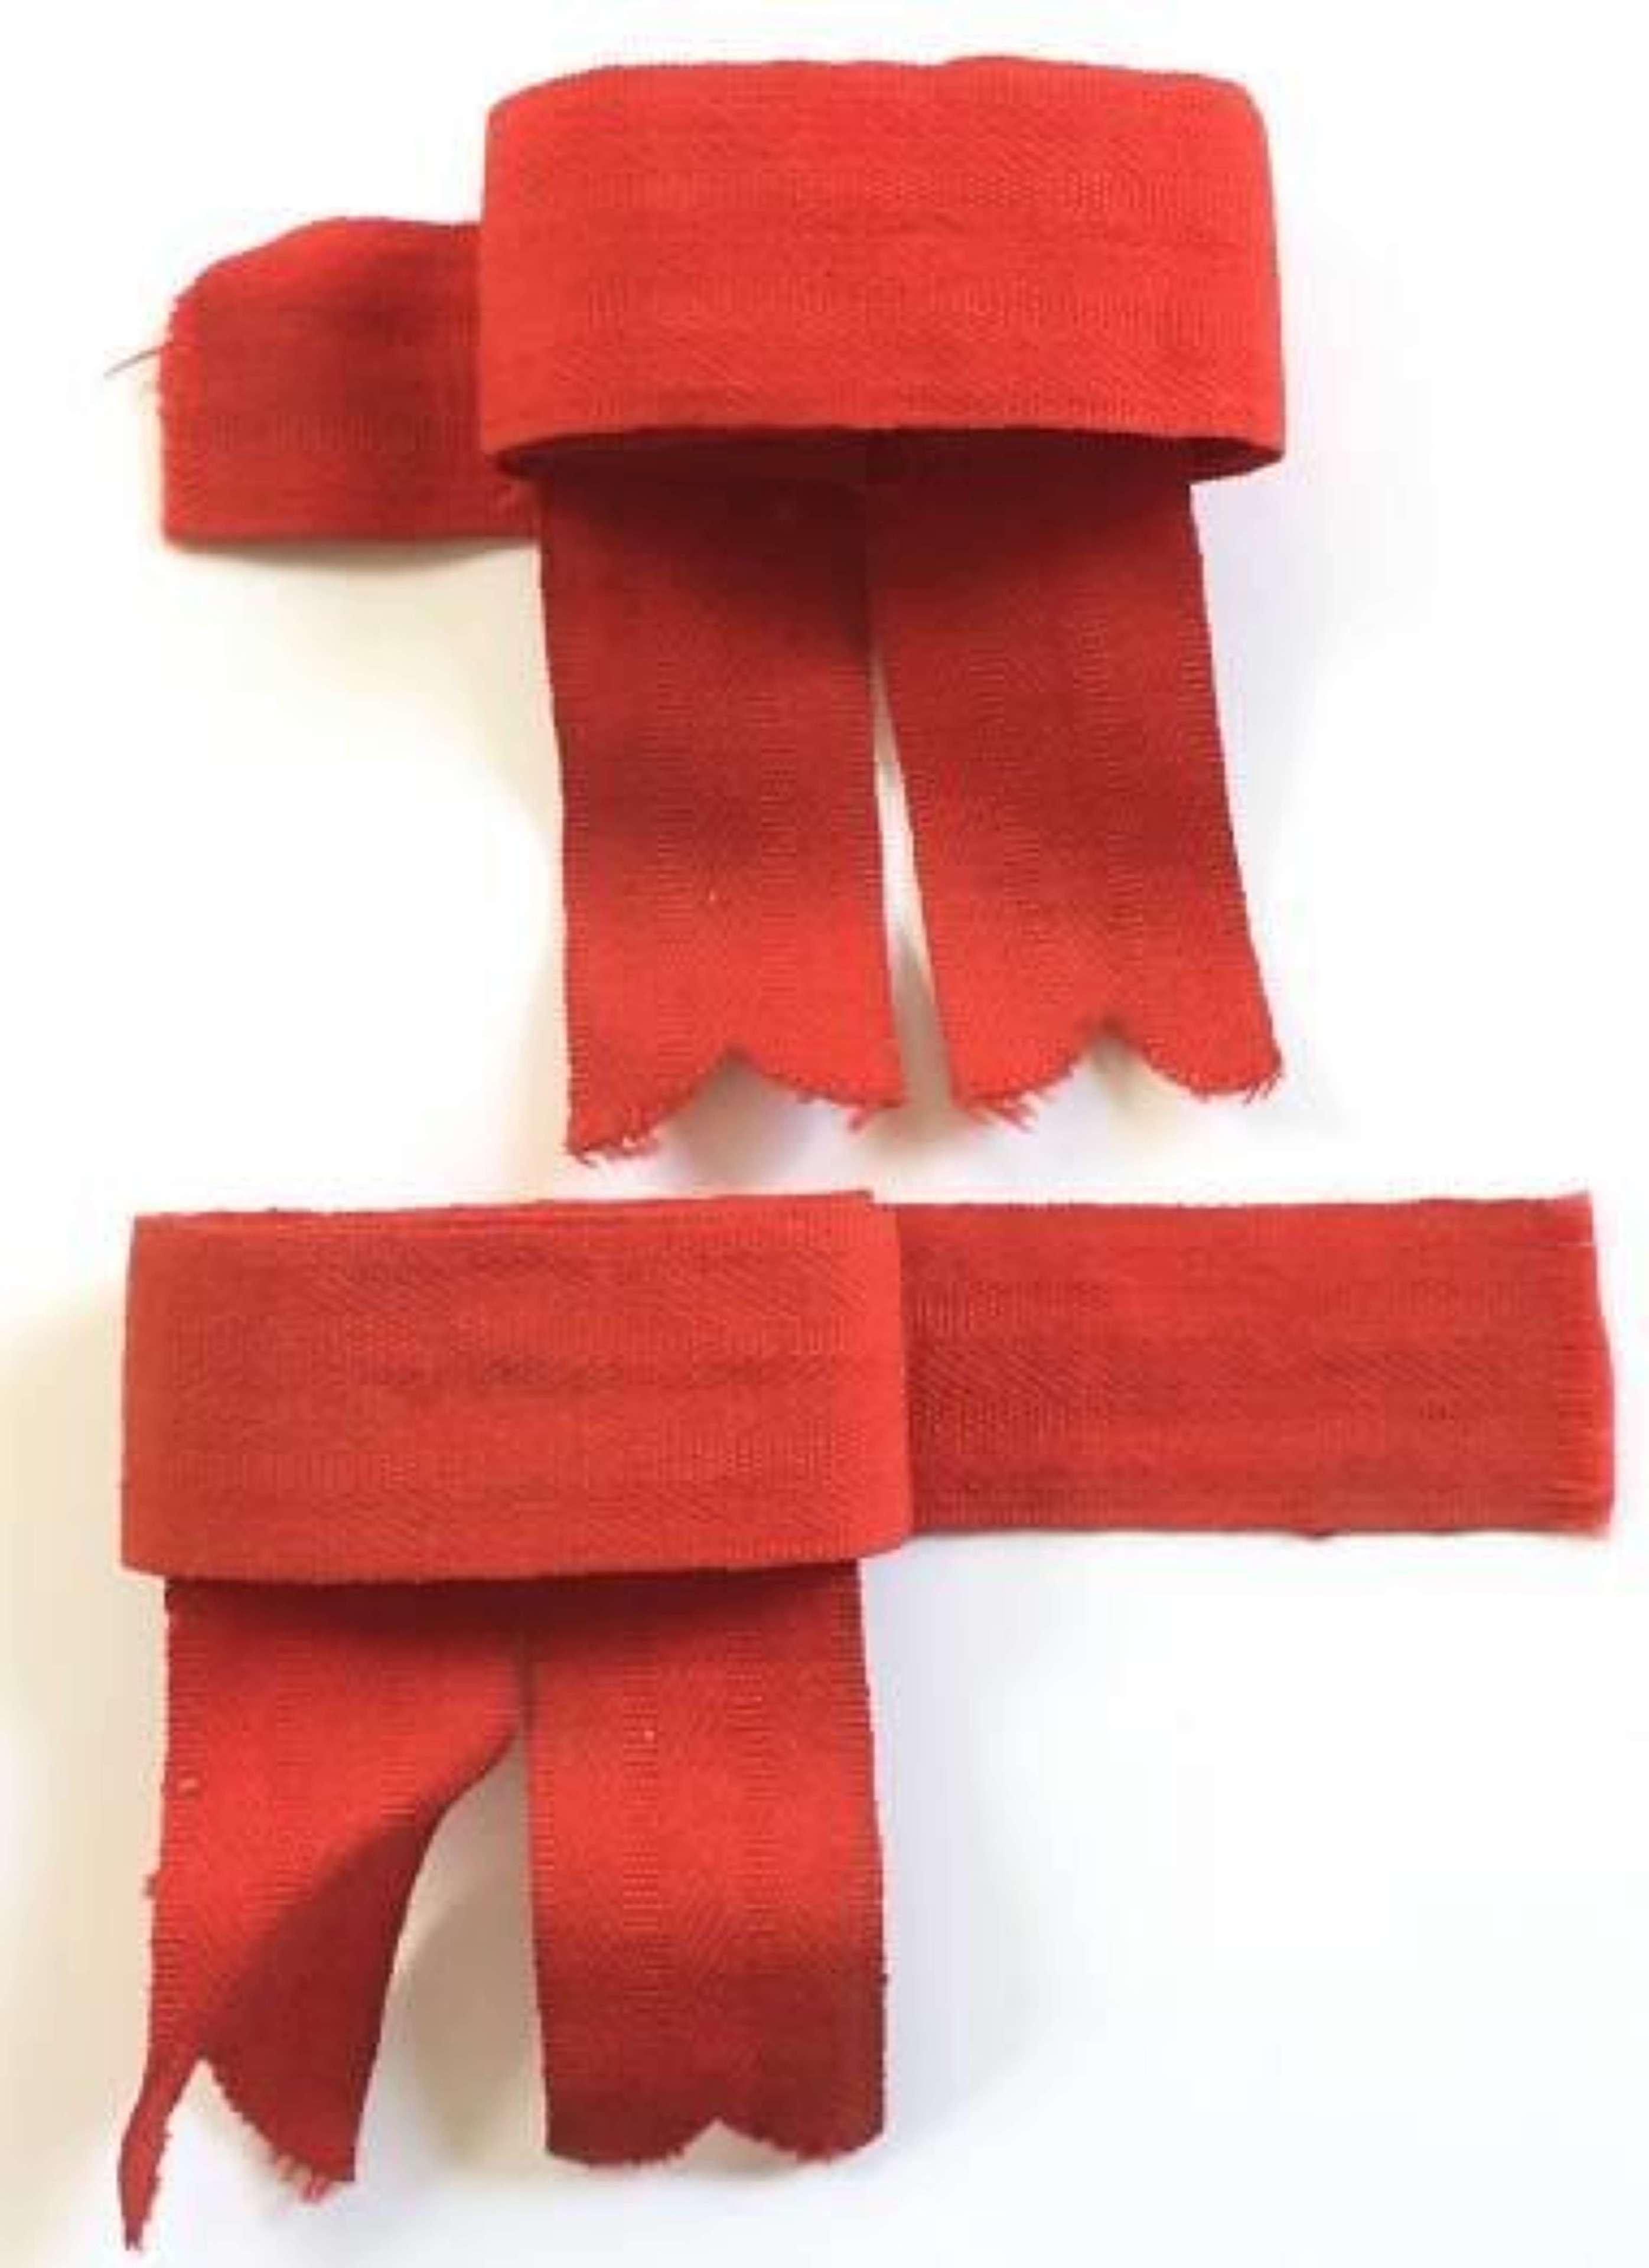 WW1 Highland Regiment Hose Tops Ribbons.